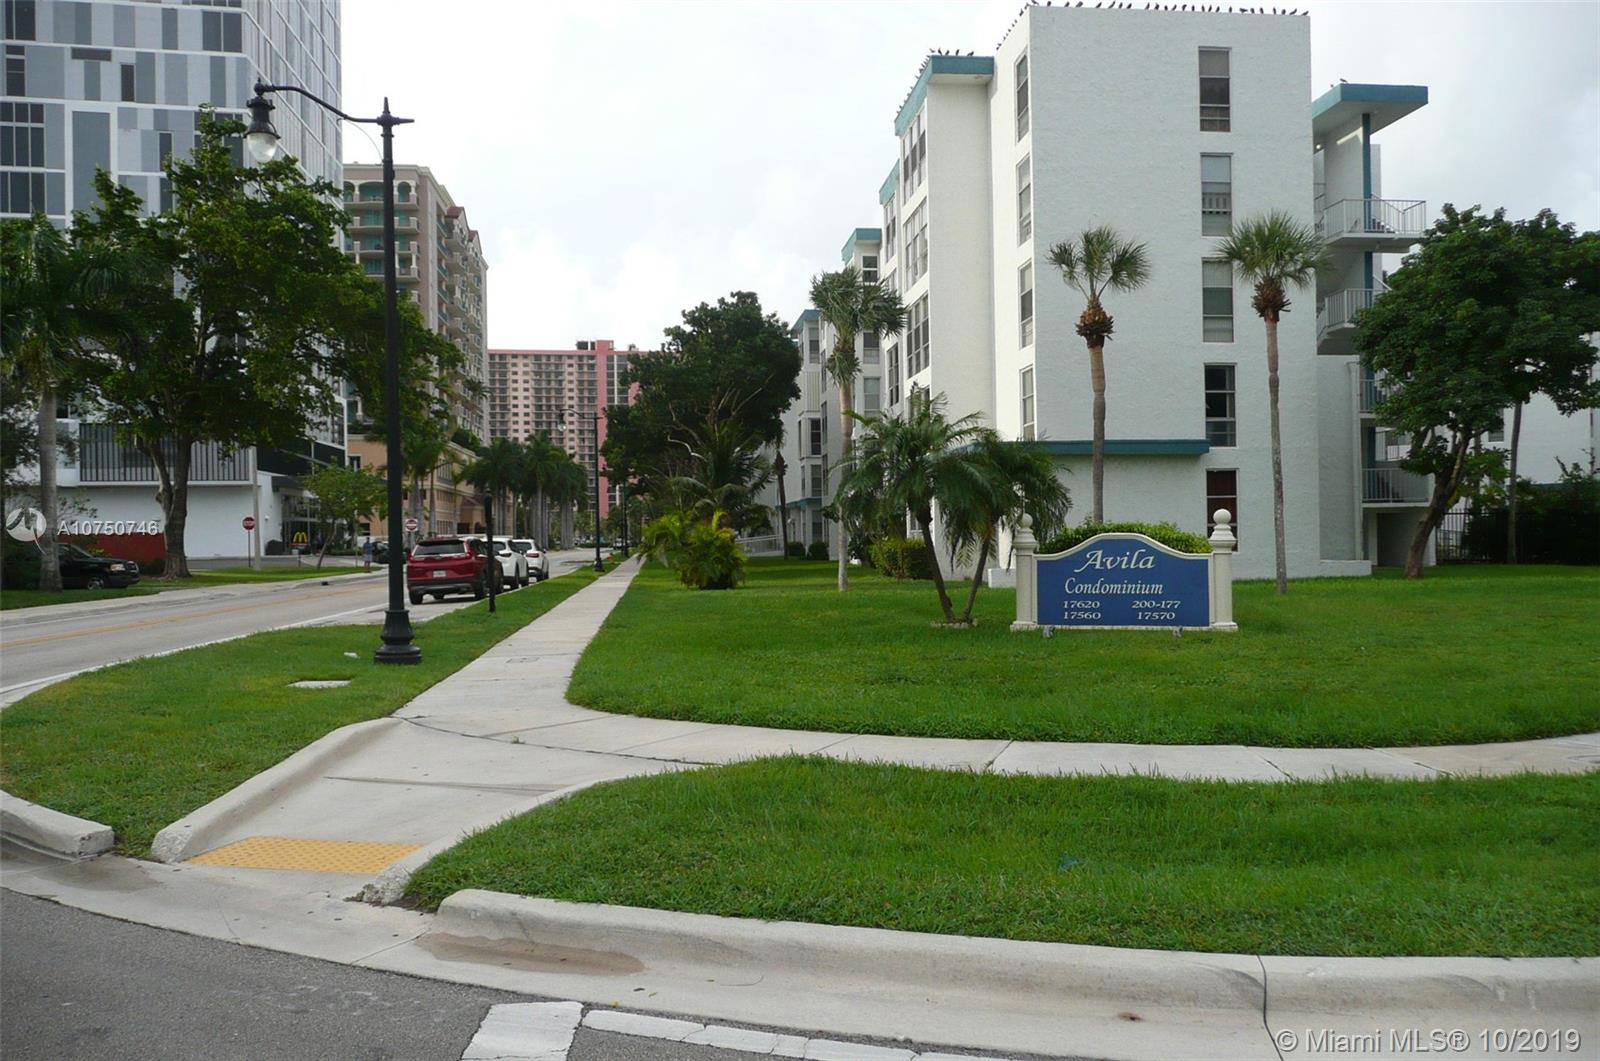 17570 Atlantic Blvd 107, Sunny Isles Beach, FL 33160